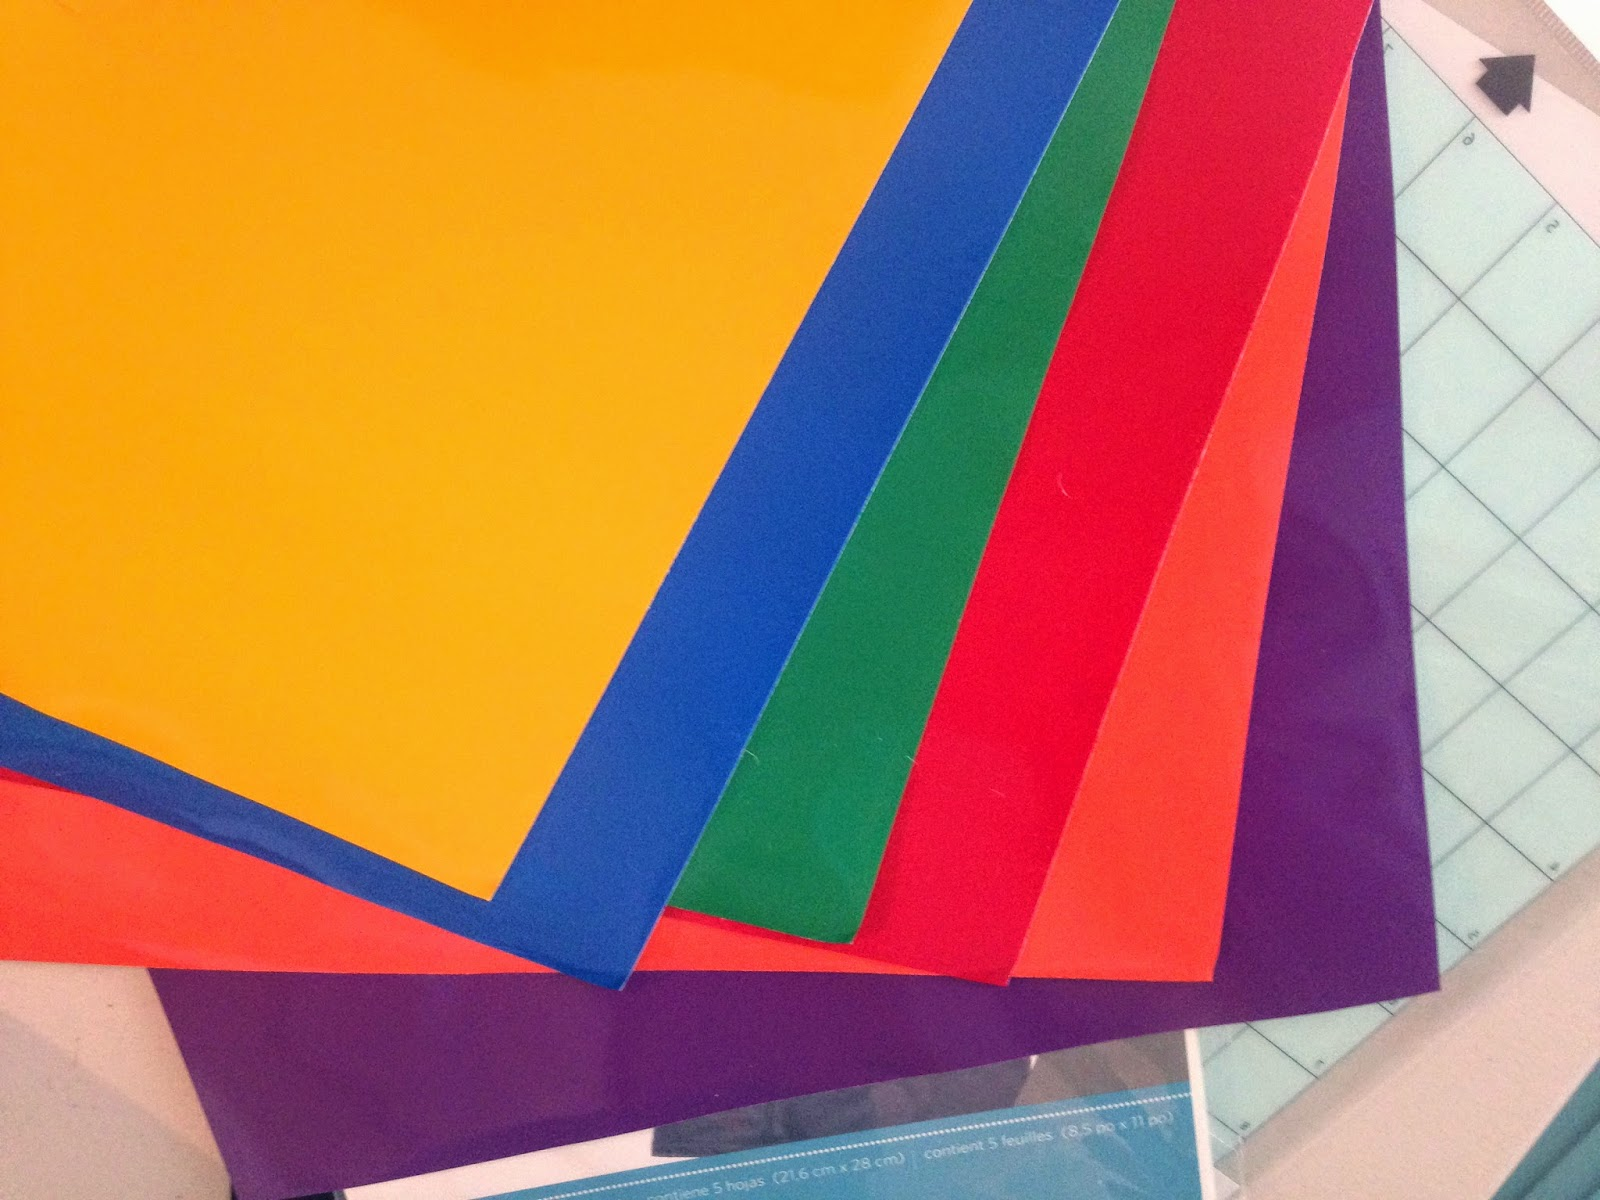 Silhouette Studio, Silhouette tutorial, layering vinyl, vinyl